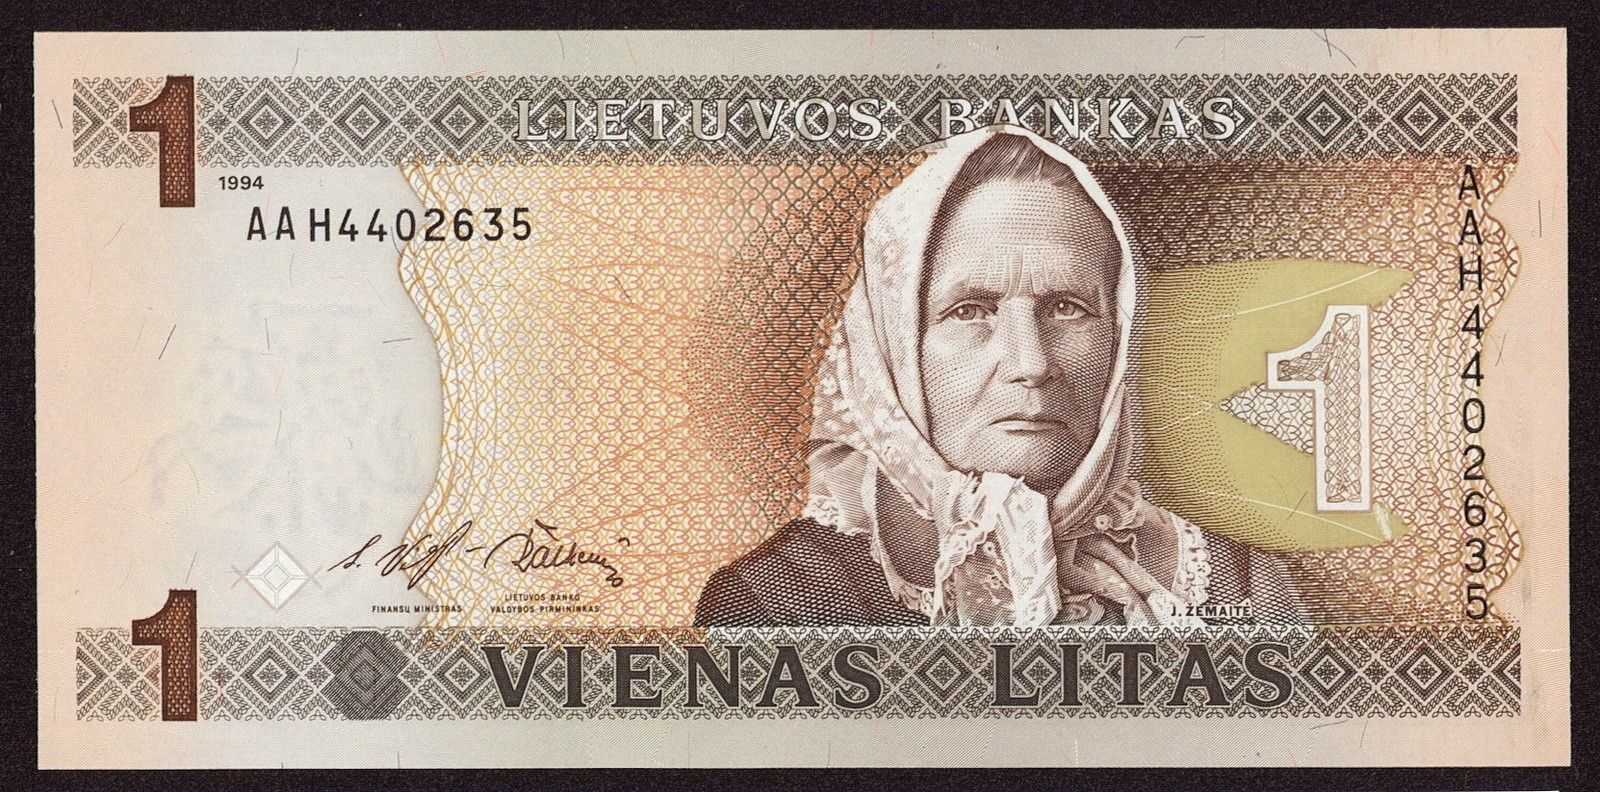 Banknotes of Lithuania 1 Litas banknote 1994 Julija Zemaite